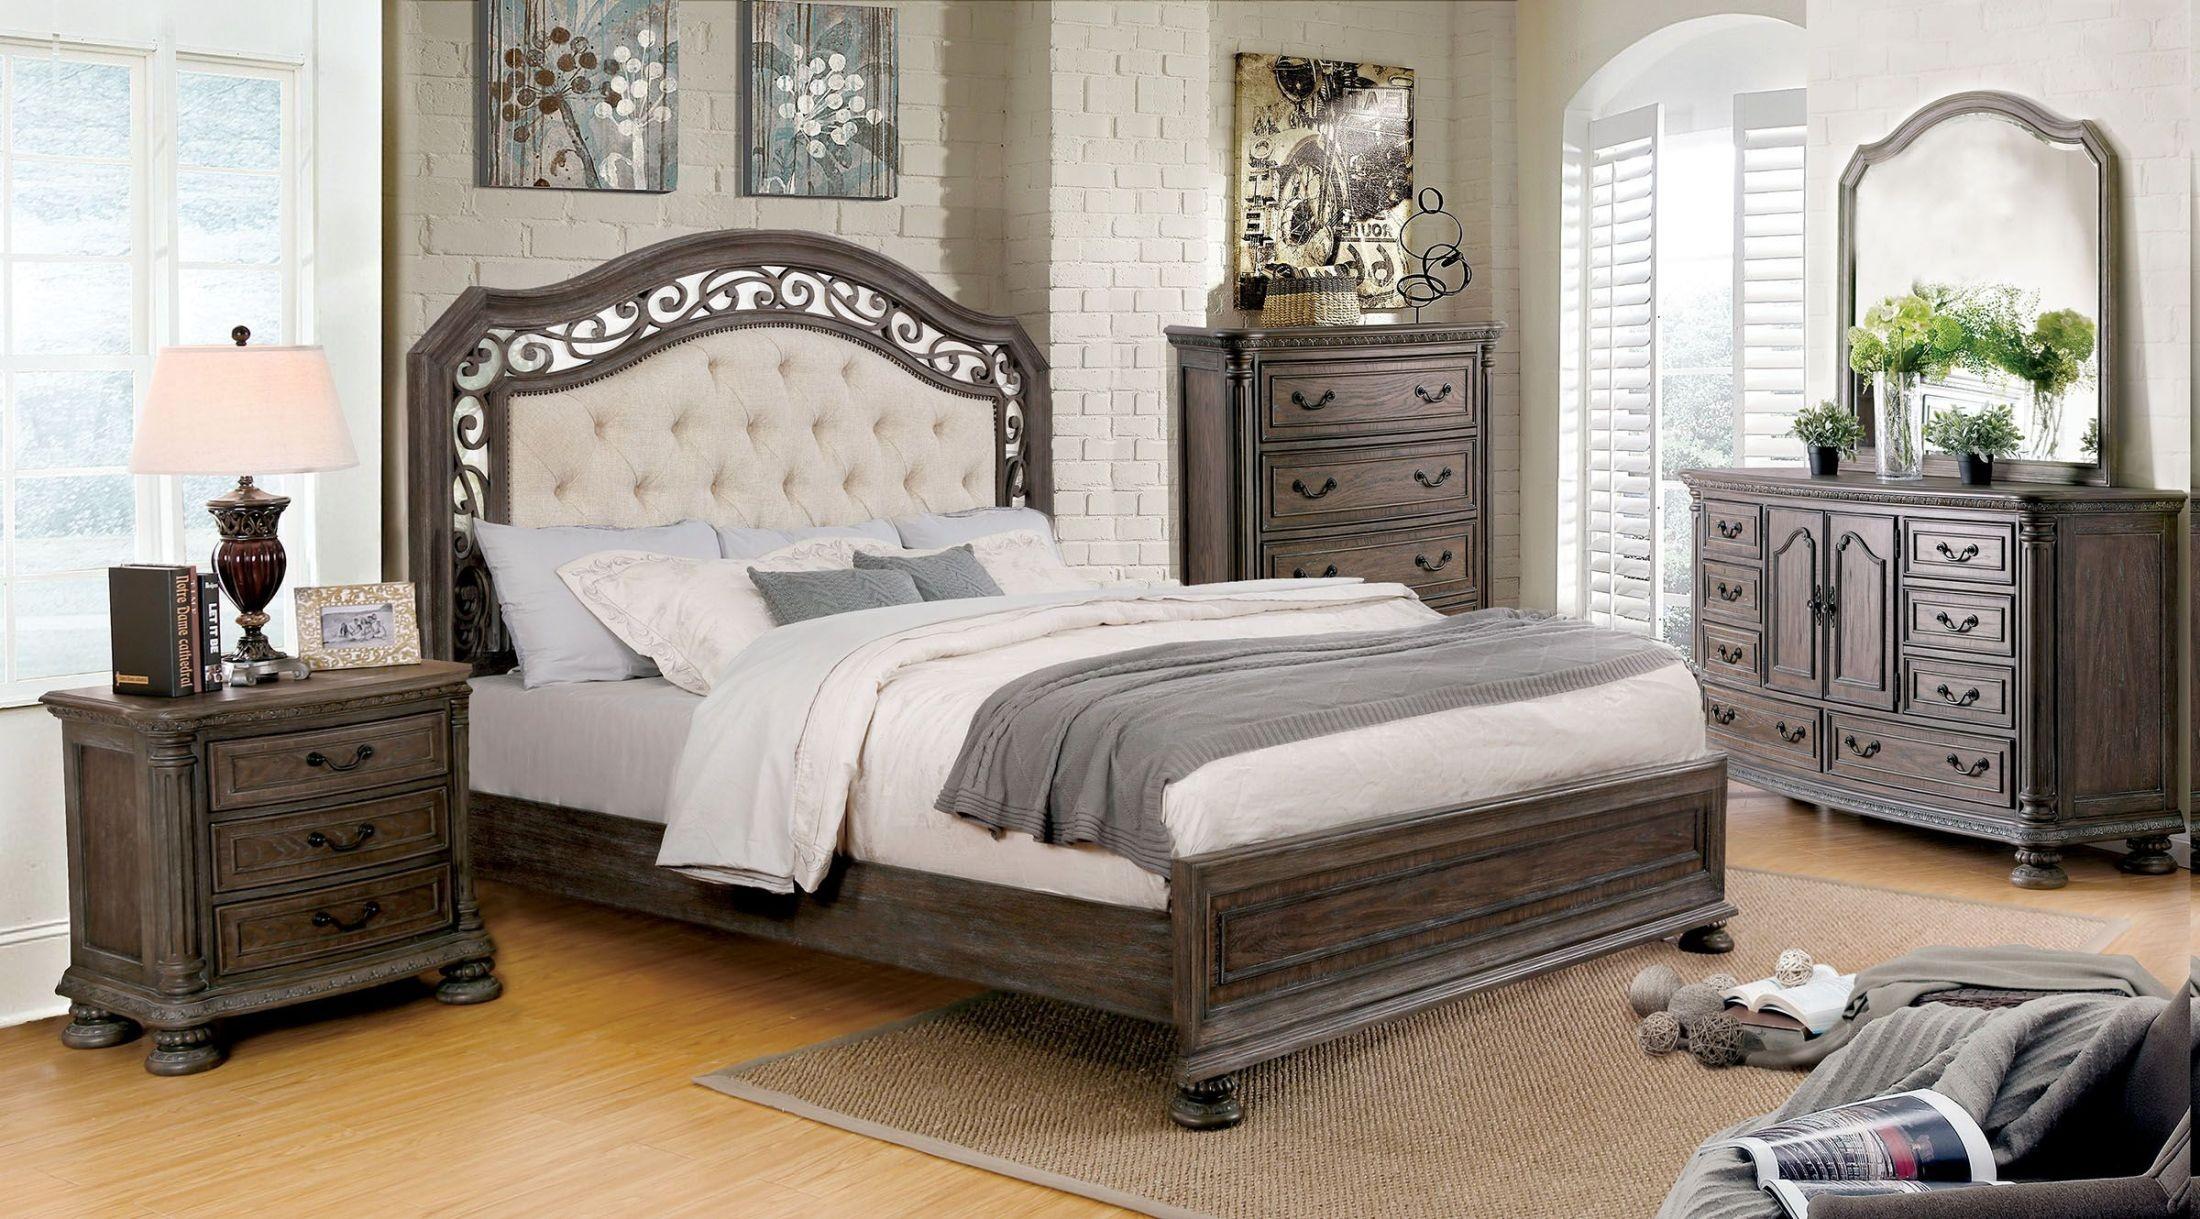 Persephone Rustic Natural Tone Upholstered Platform Bedroom Set From Furniture Of America